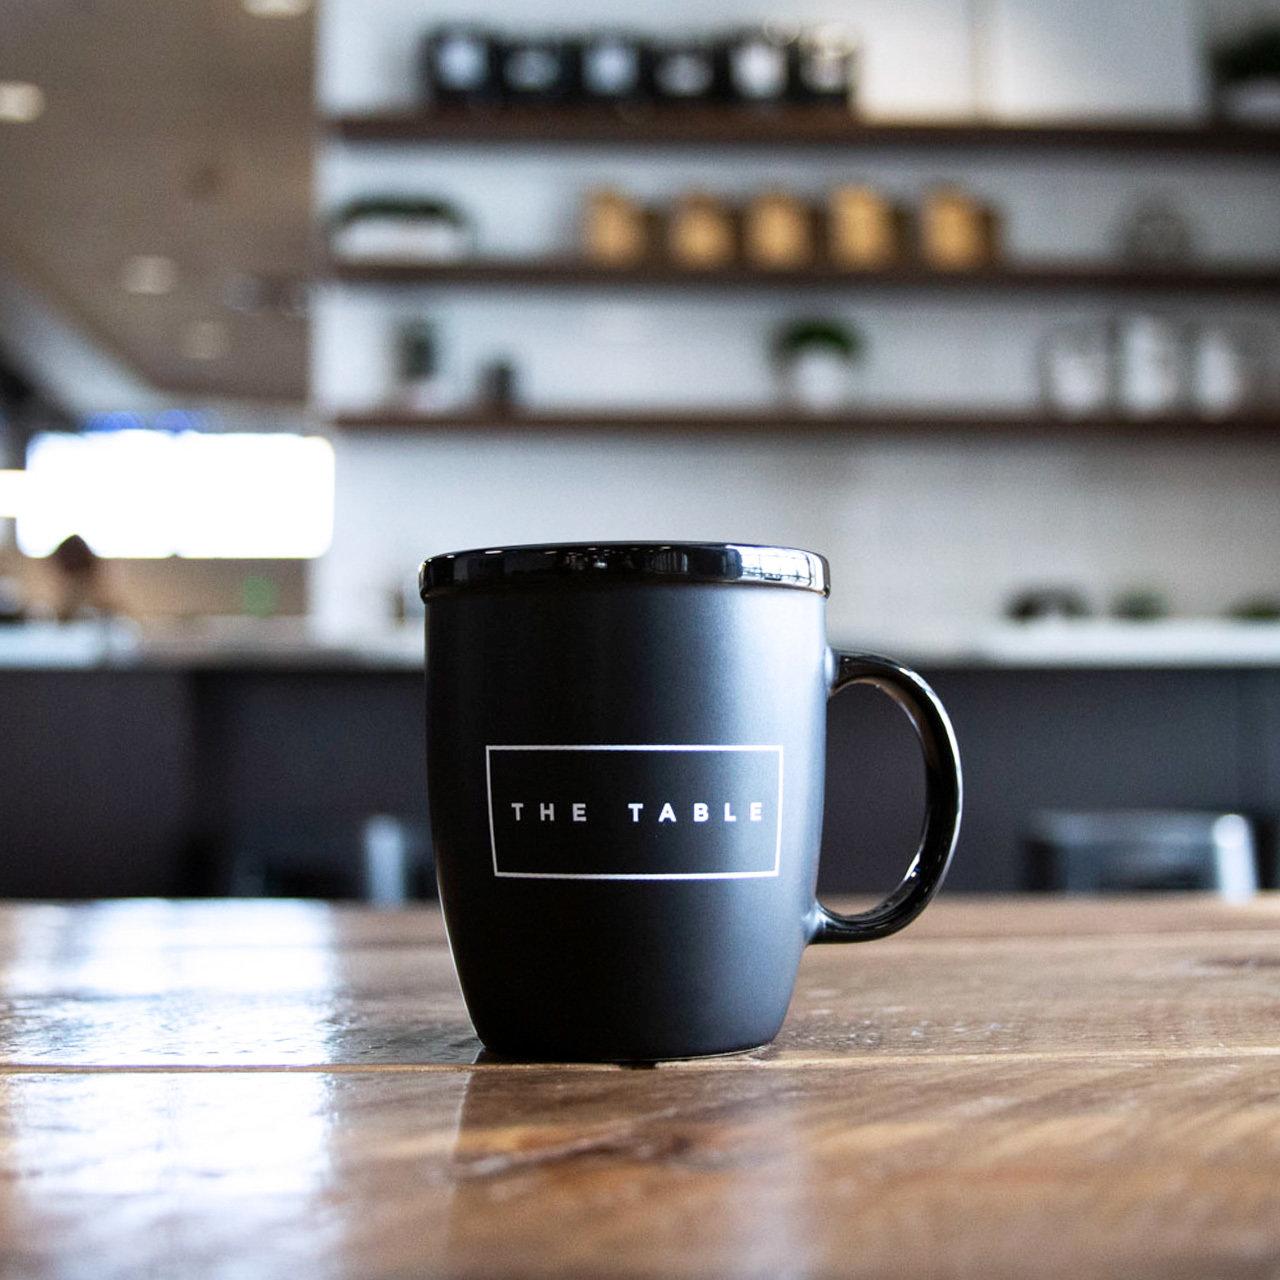 13 oz ceramic mug